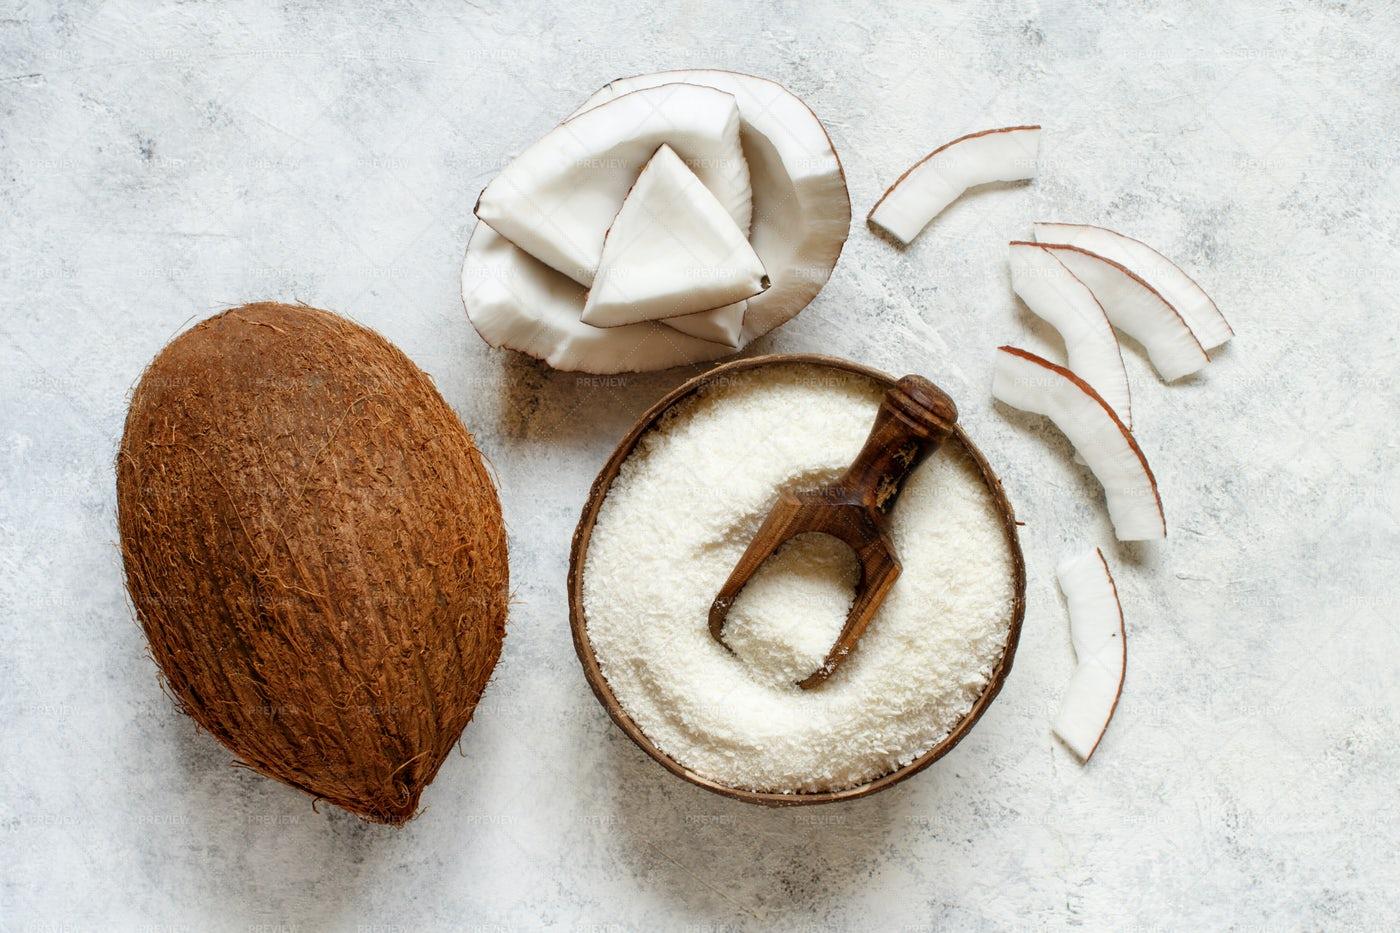 Coconut Flour And Pieces: Stock Photos